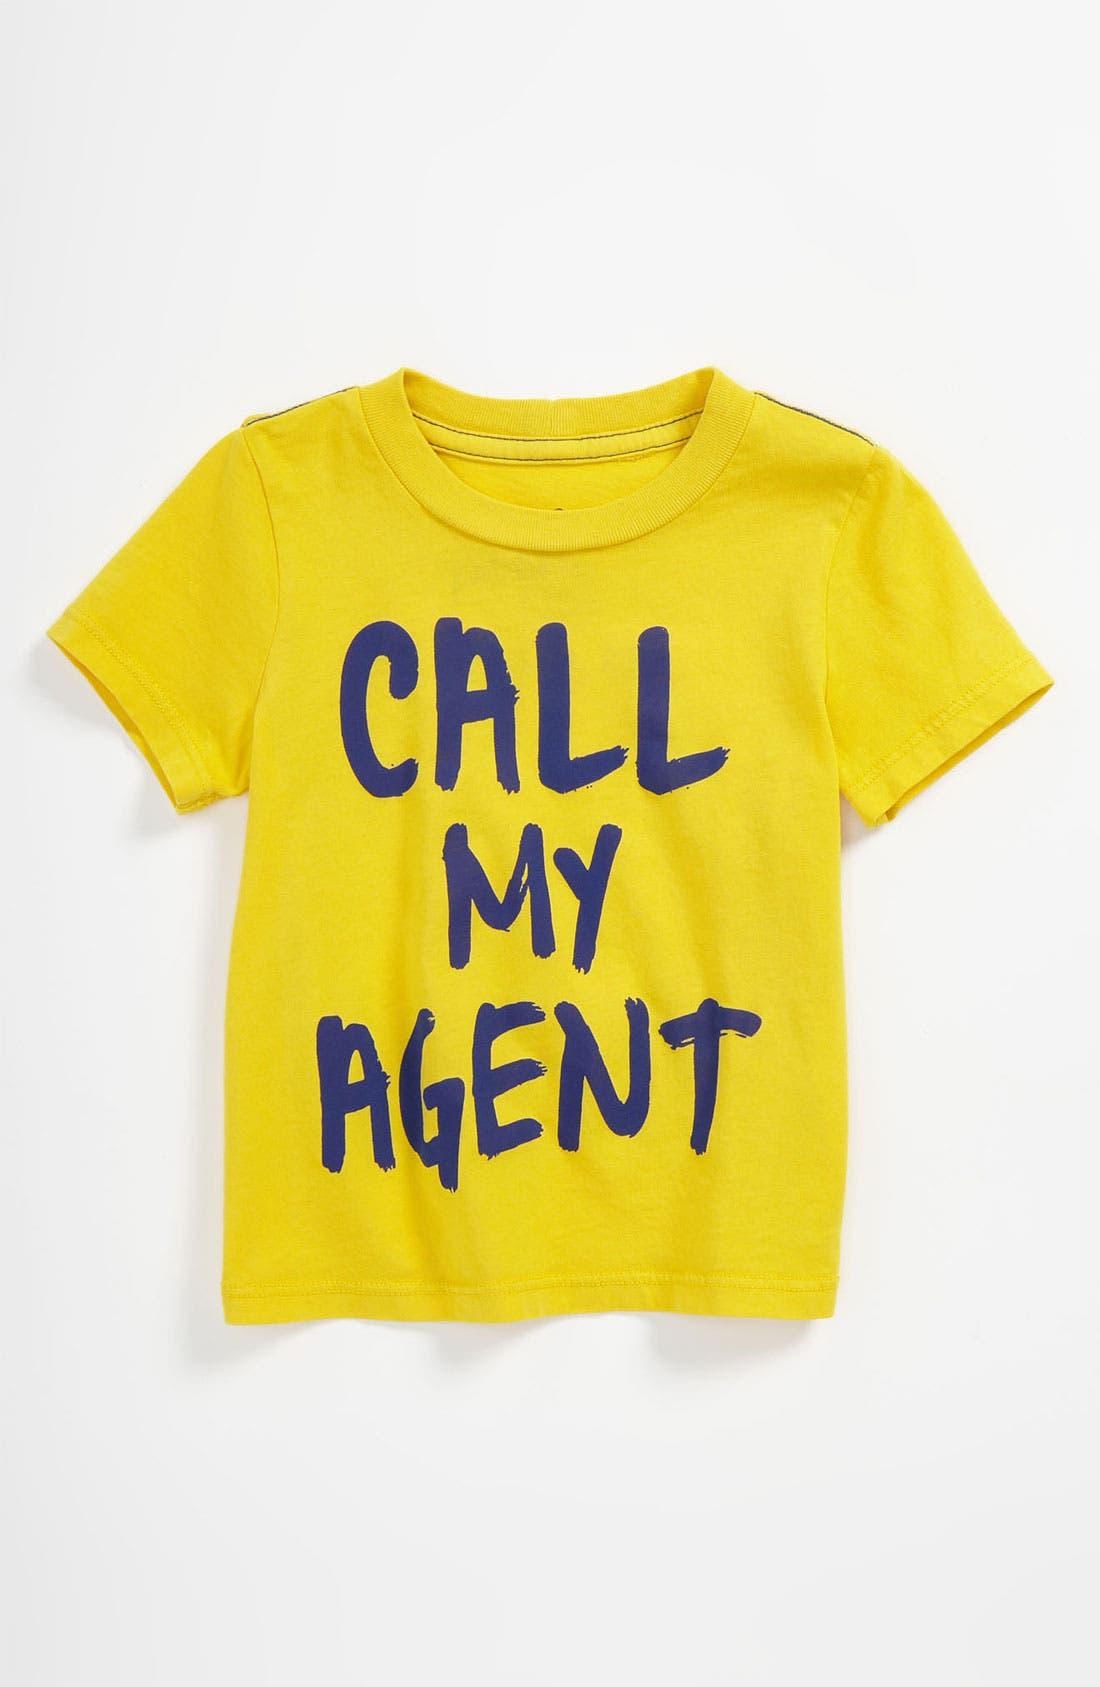 Alternate Image 1 Selected - Peek 'Call My Agent' Tee (Baby)